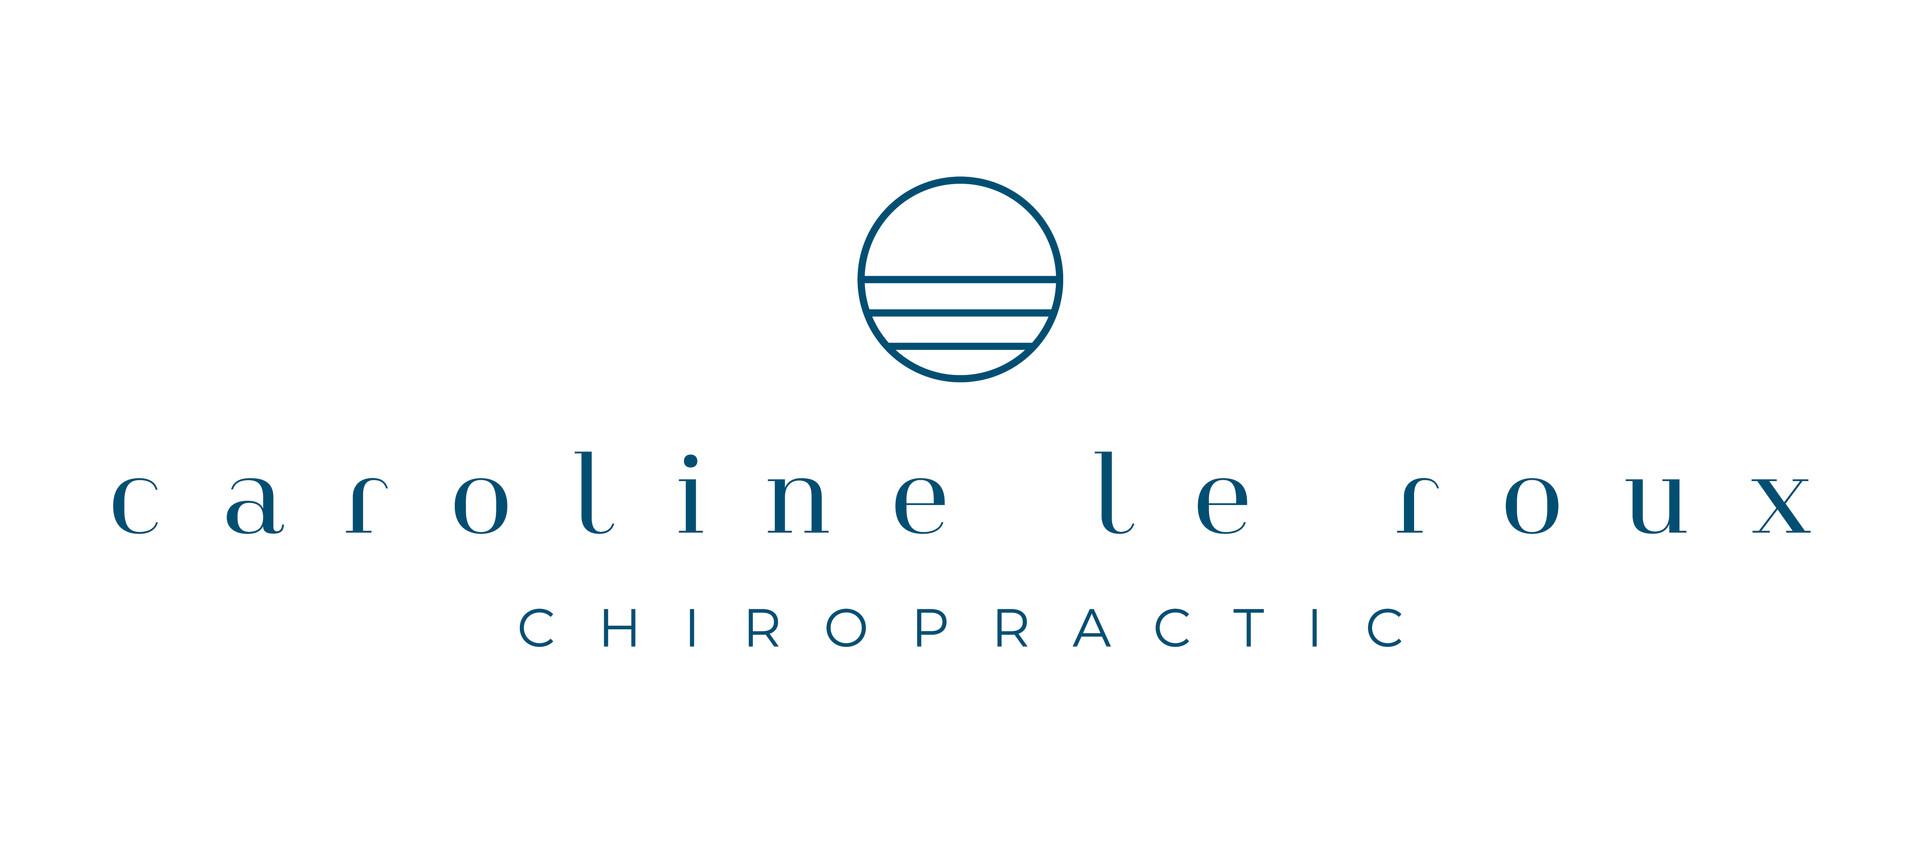 Caroline Le Roux Chiropractic Branding | Brand Identity Design by Fresh Leaf Creative